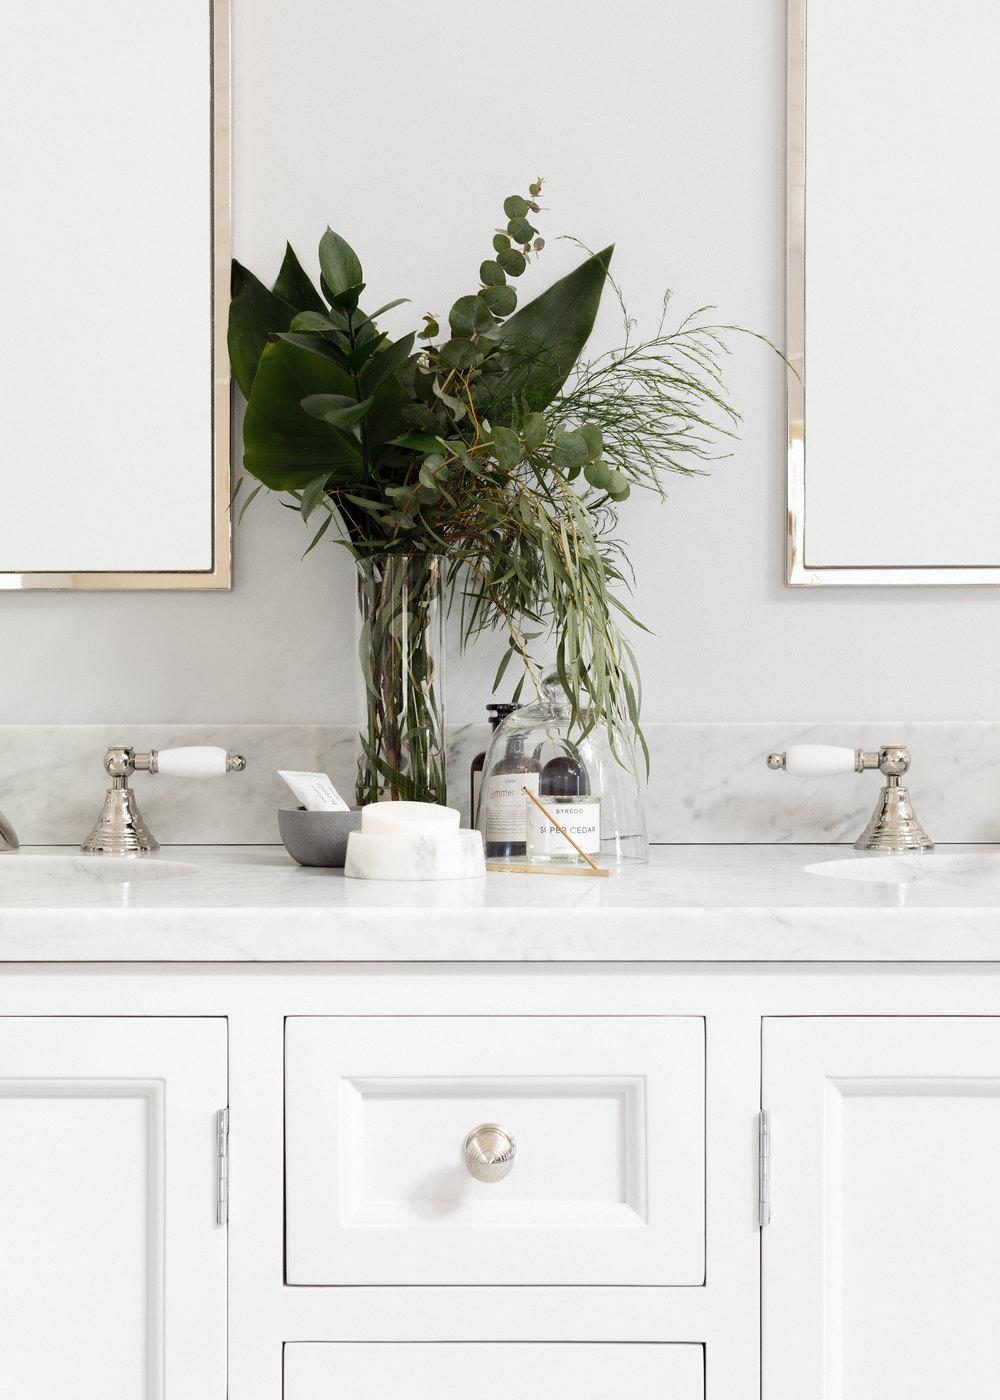 Porter_bathroom_vanities_the_Chester_01.jpg